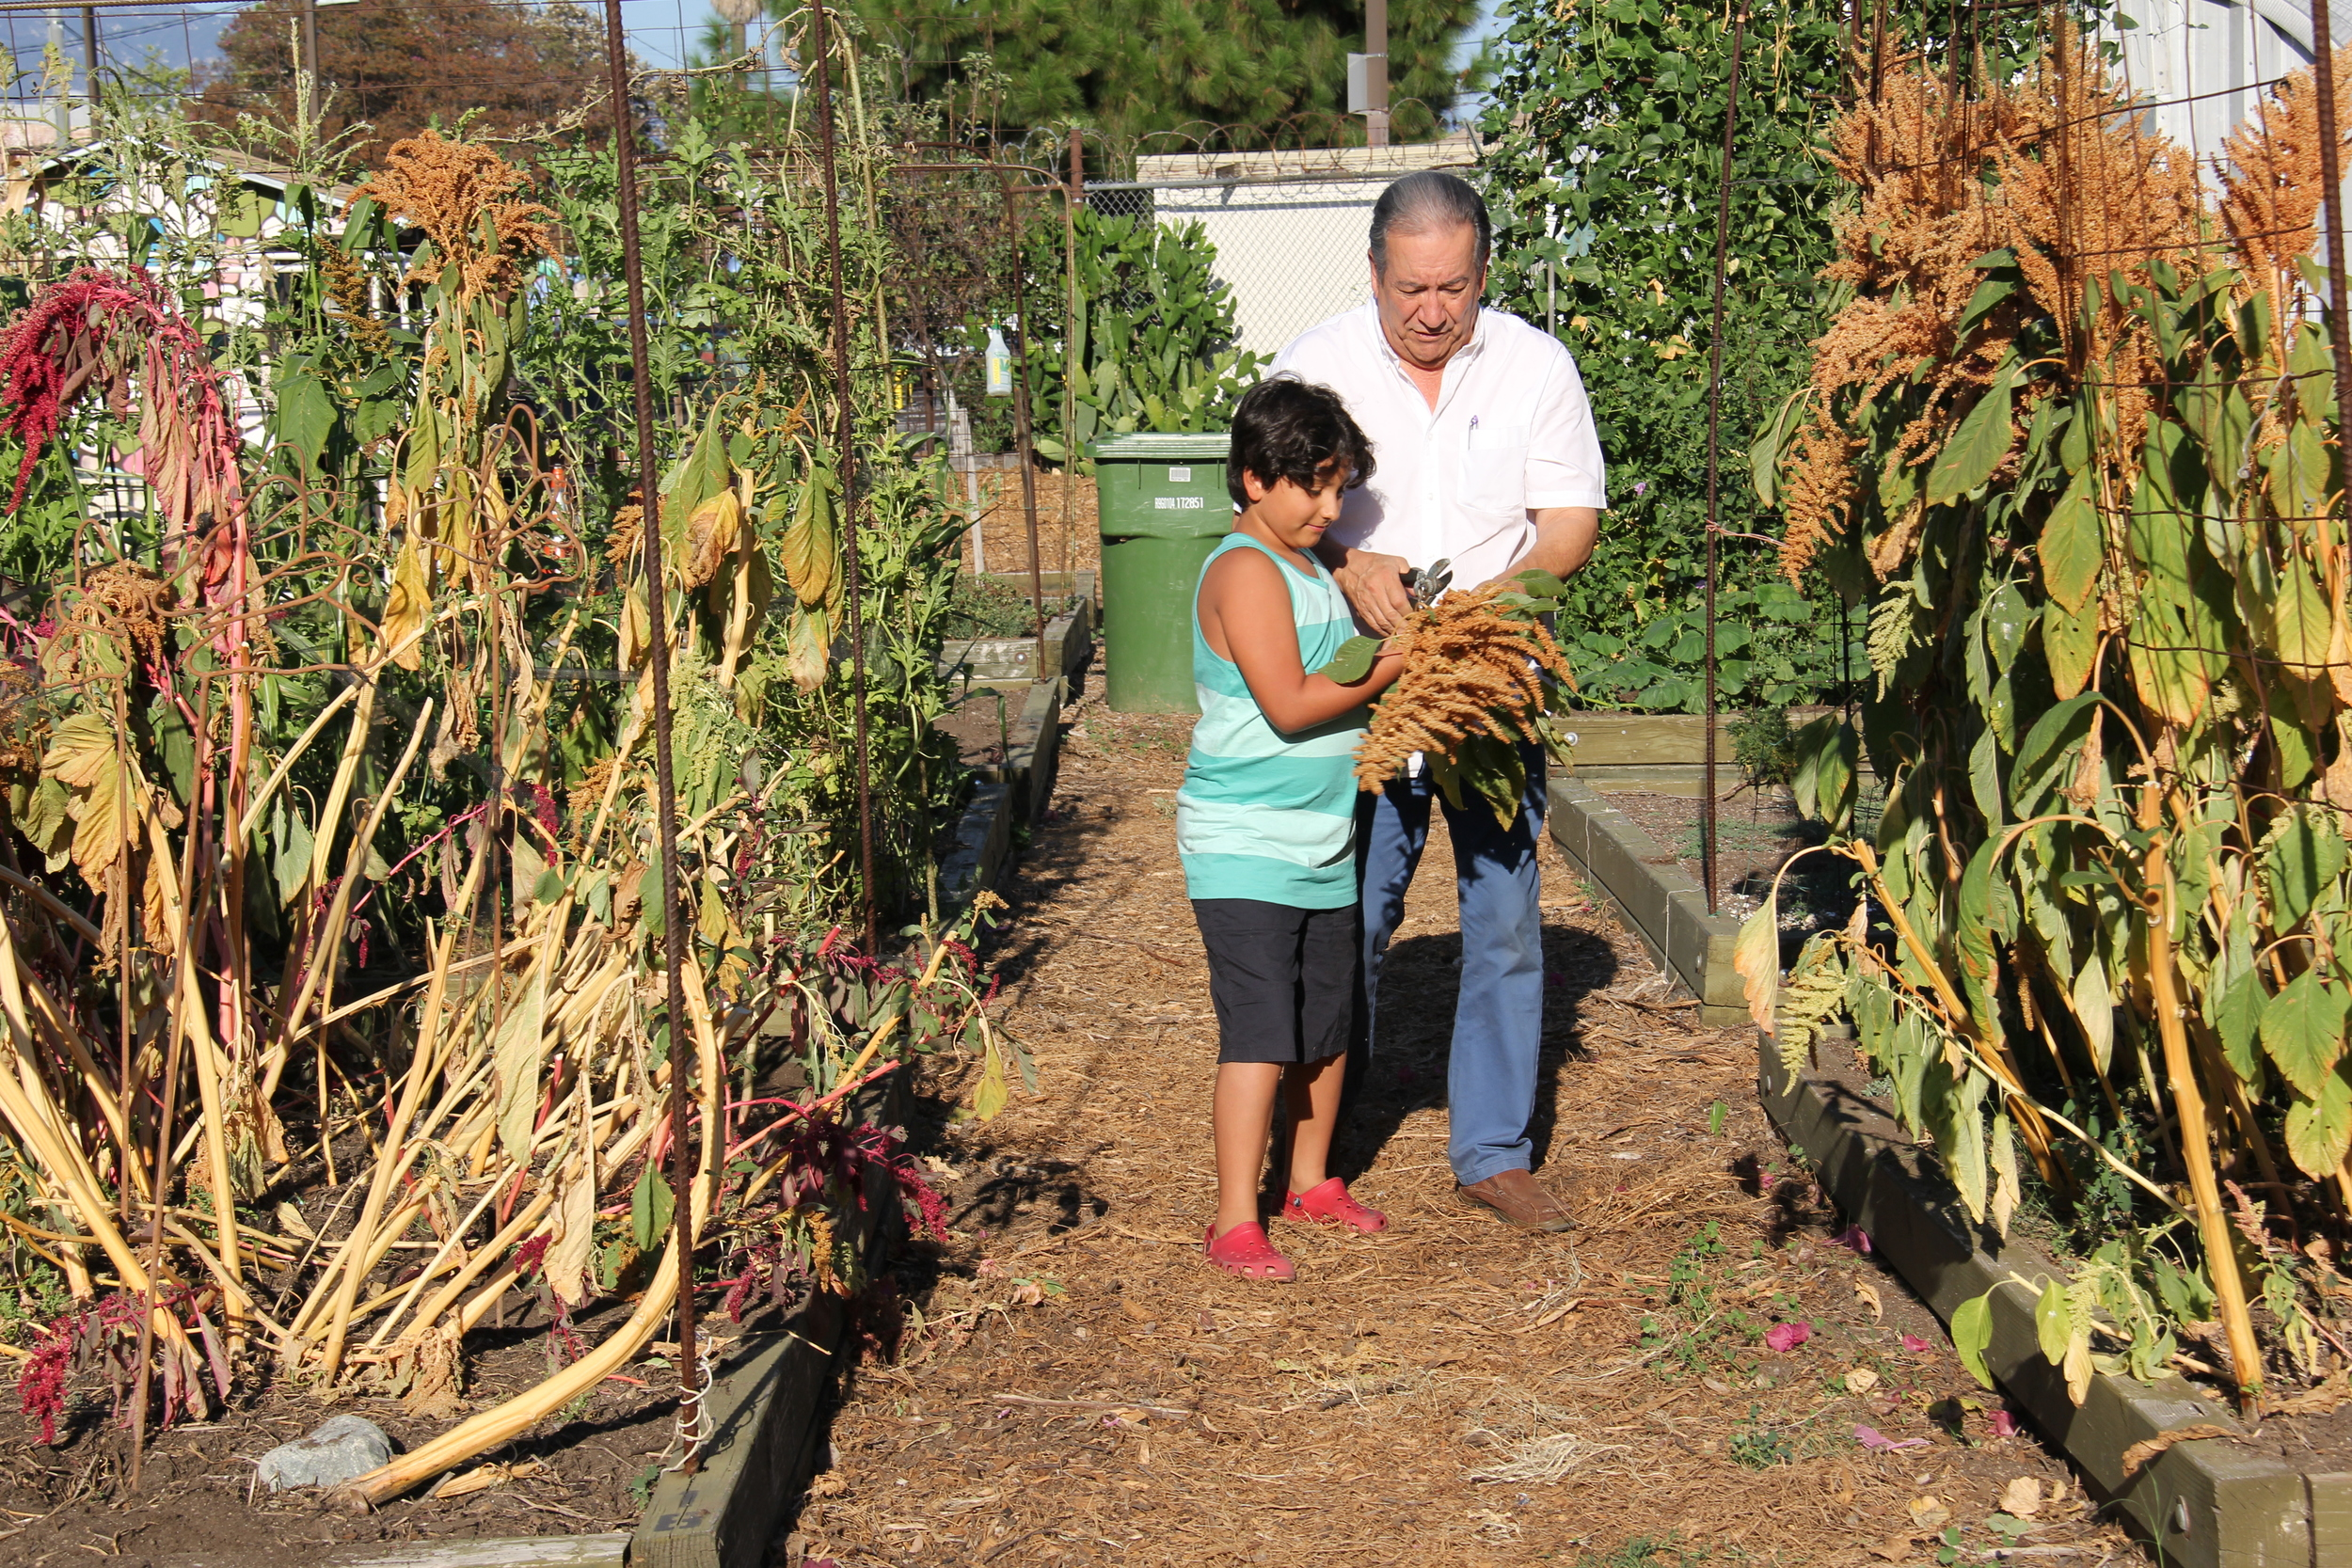 Amaranth Harvest Milagro Allegro Community Garden, Highland Park, California 2015